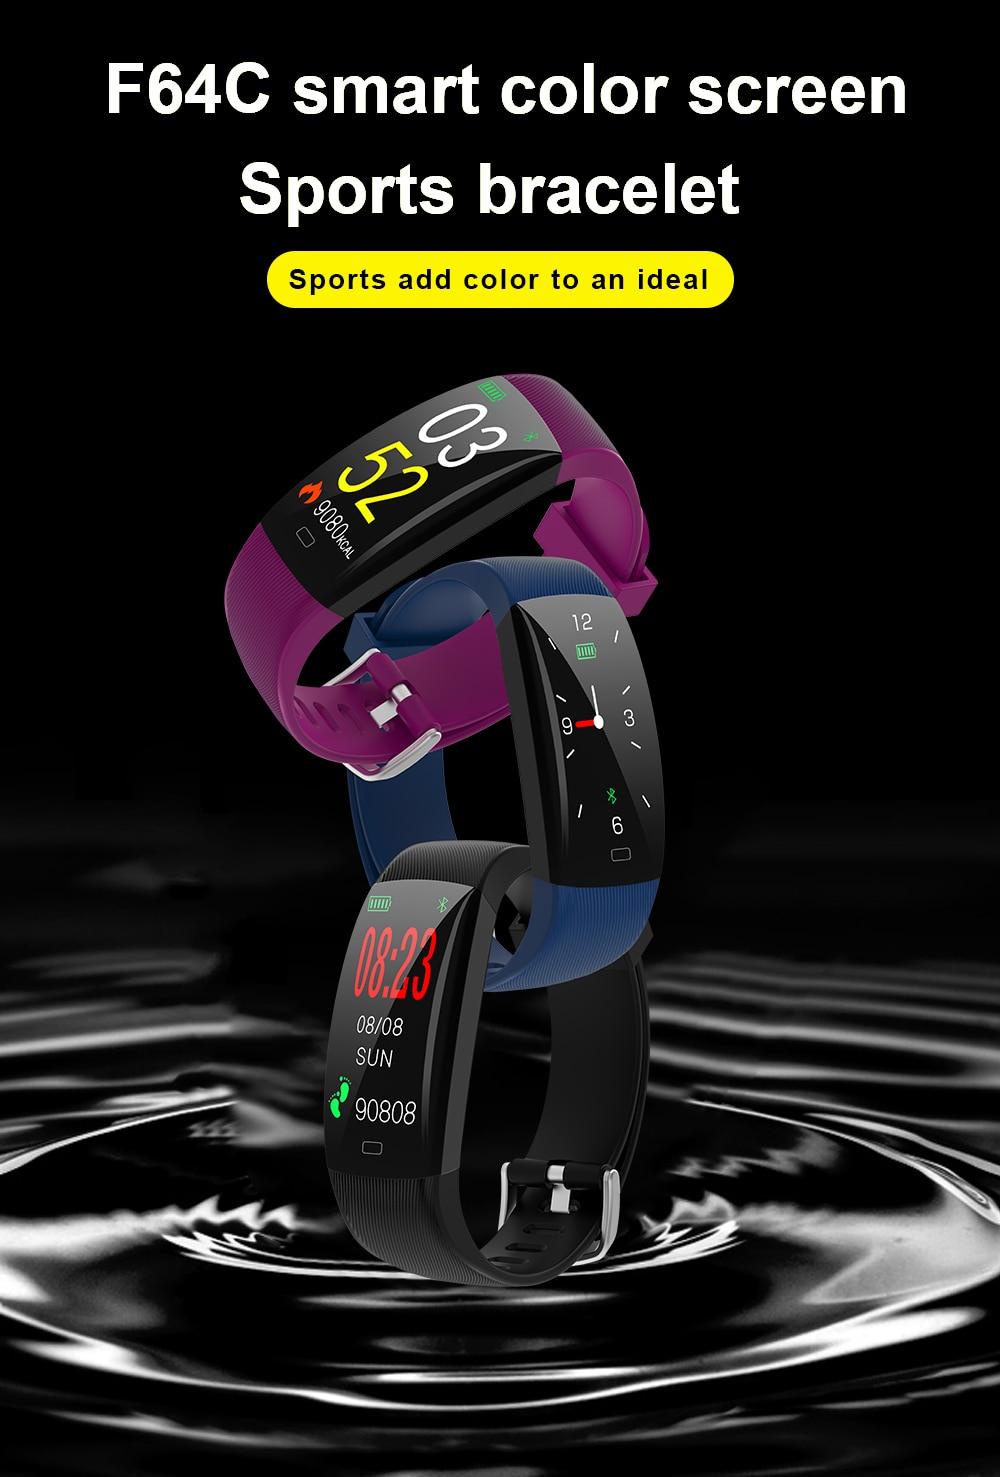 F64C Smart Wristband Καρδιακός ρυθμός Smart - Έξυπνα ηλεκτρονικά - Φωτογραφία 2